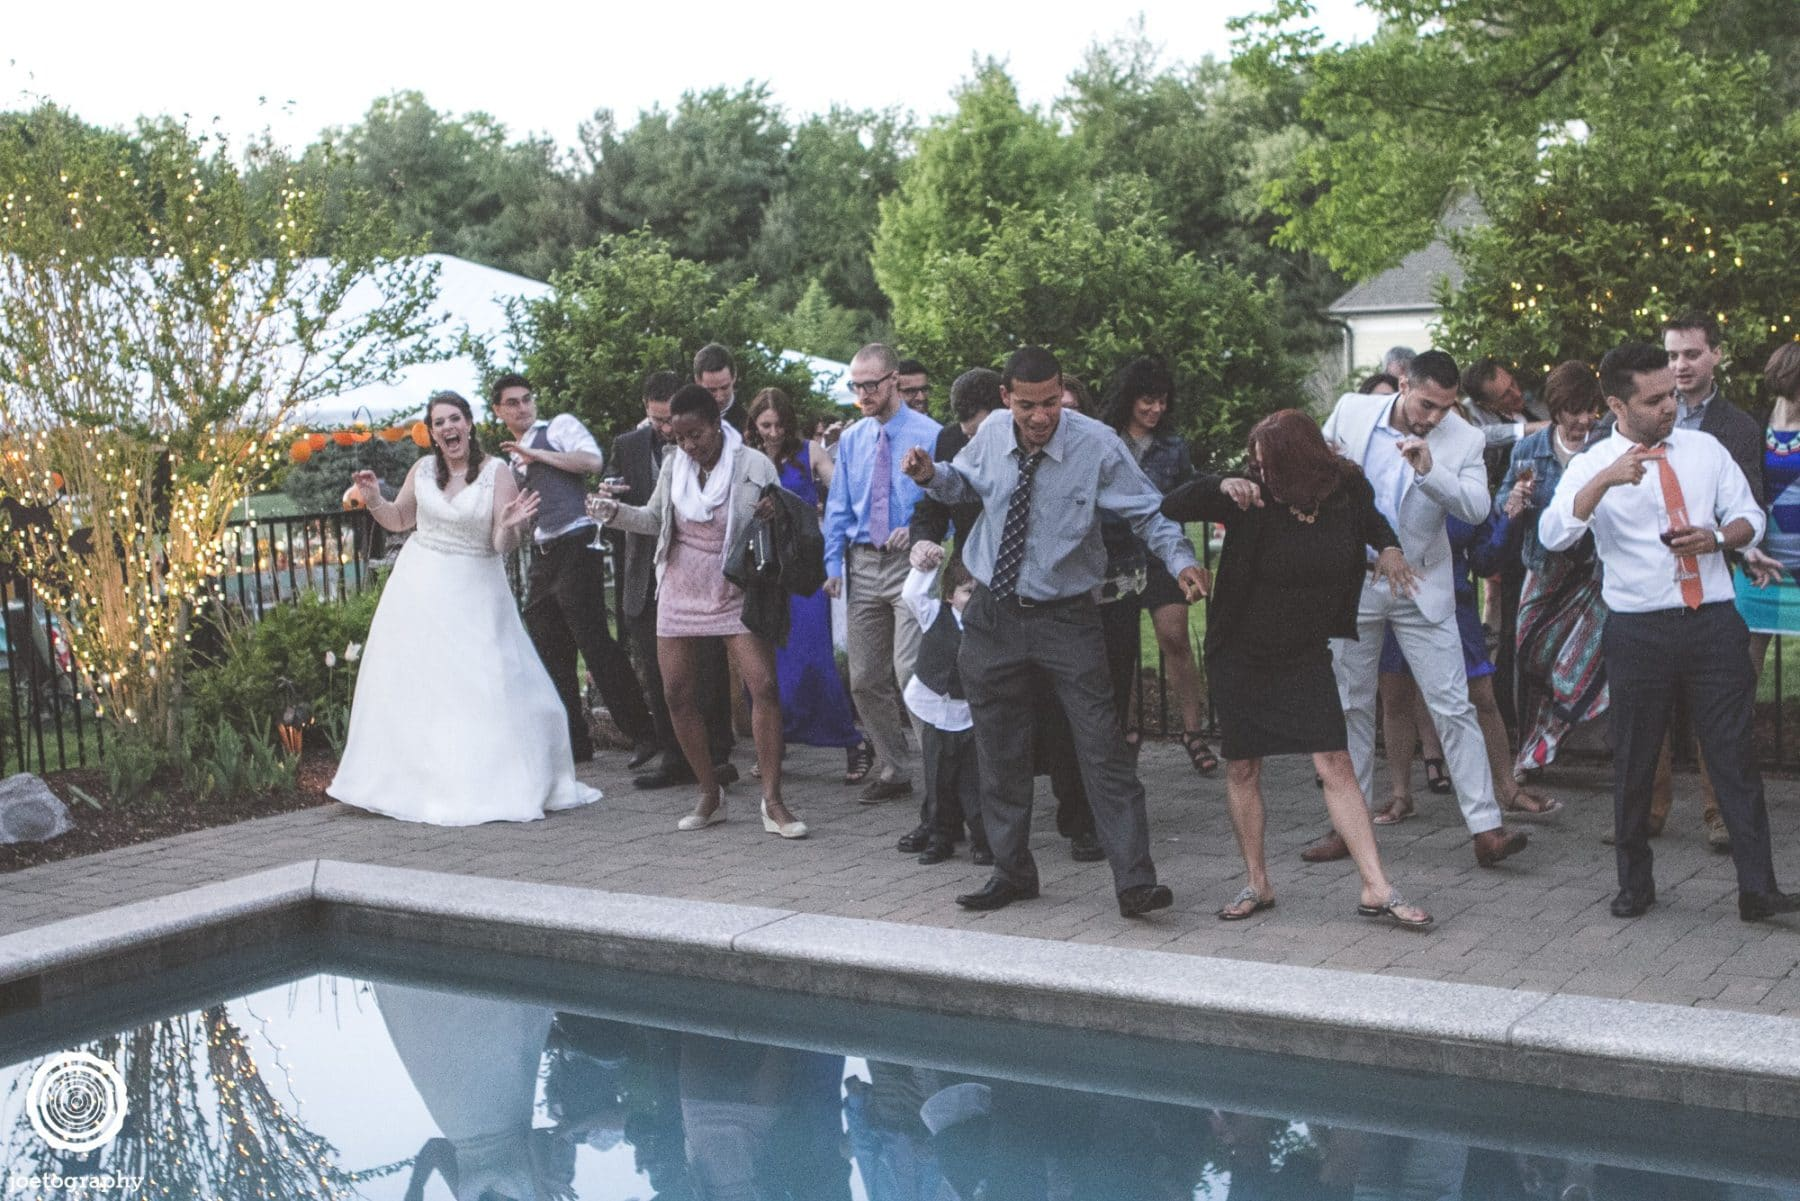 destination-wedding-fairfield-connecticut-283